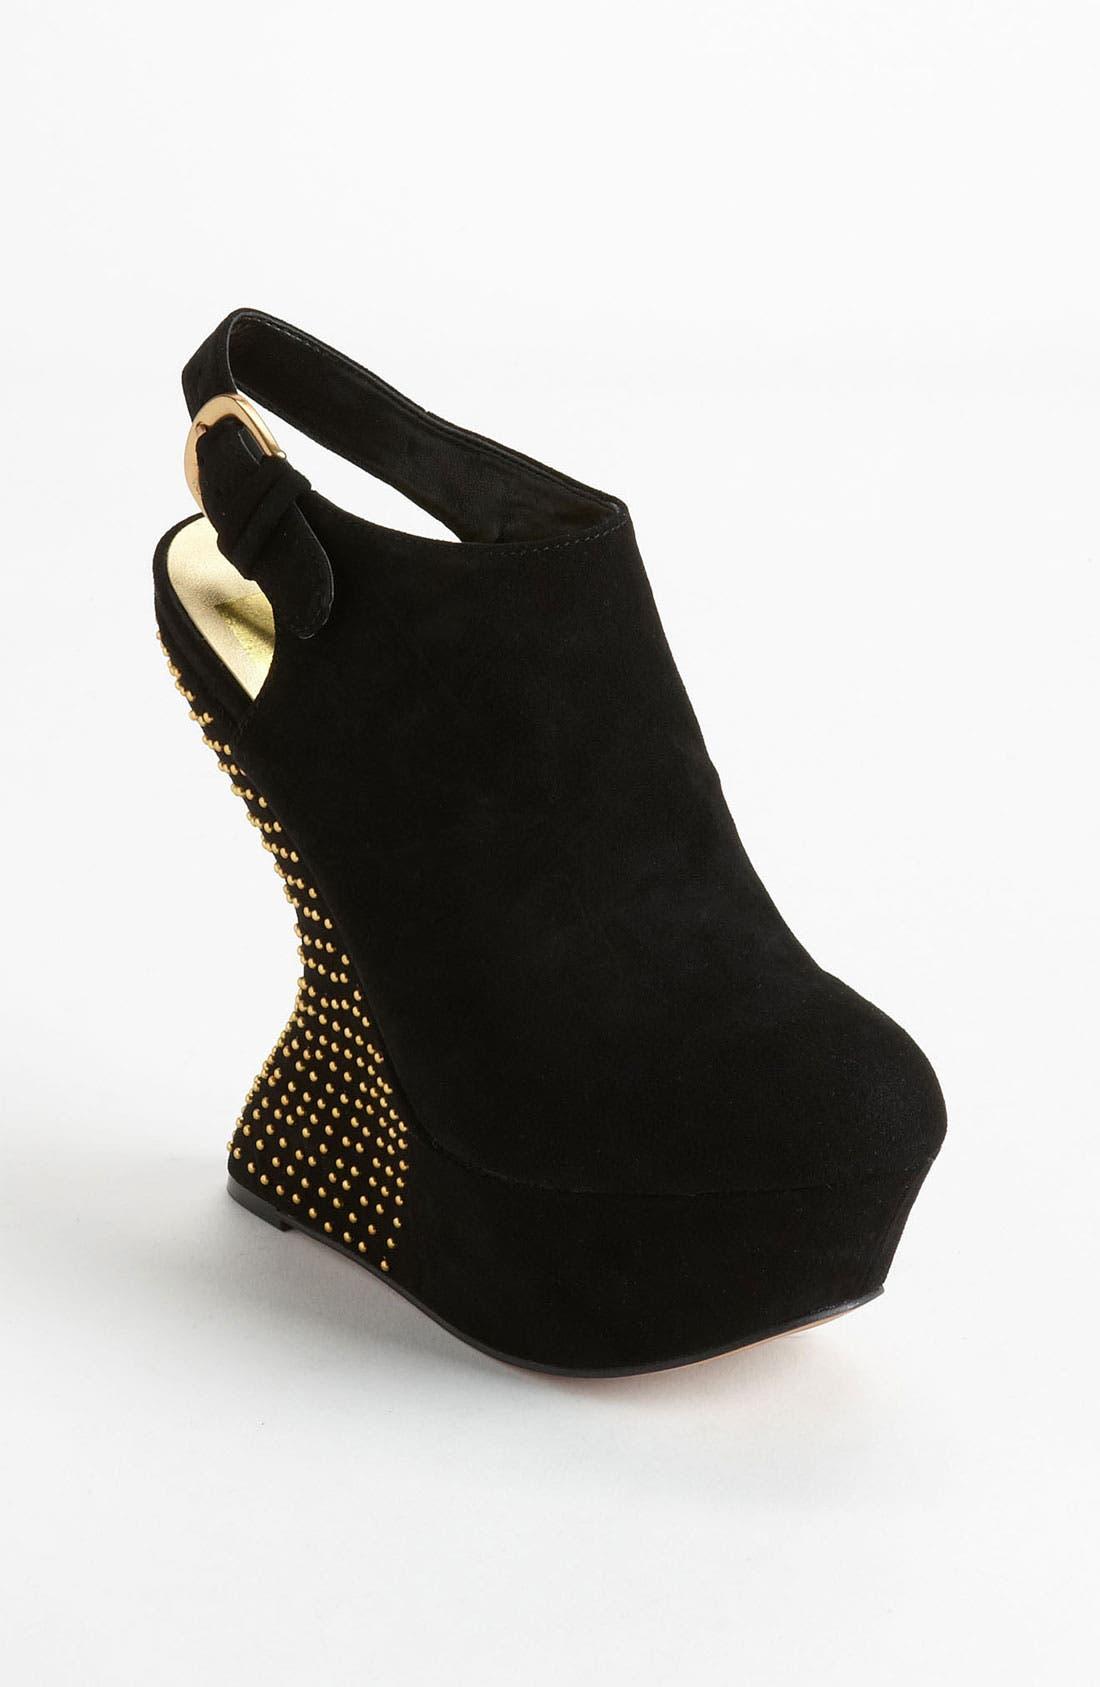 Alternate Image 1 Selected - Dolce Vita 'Leila' Wedge Sandal